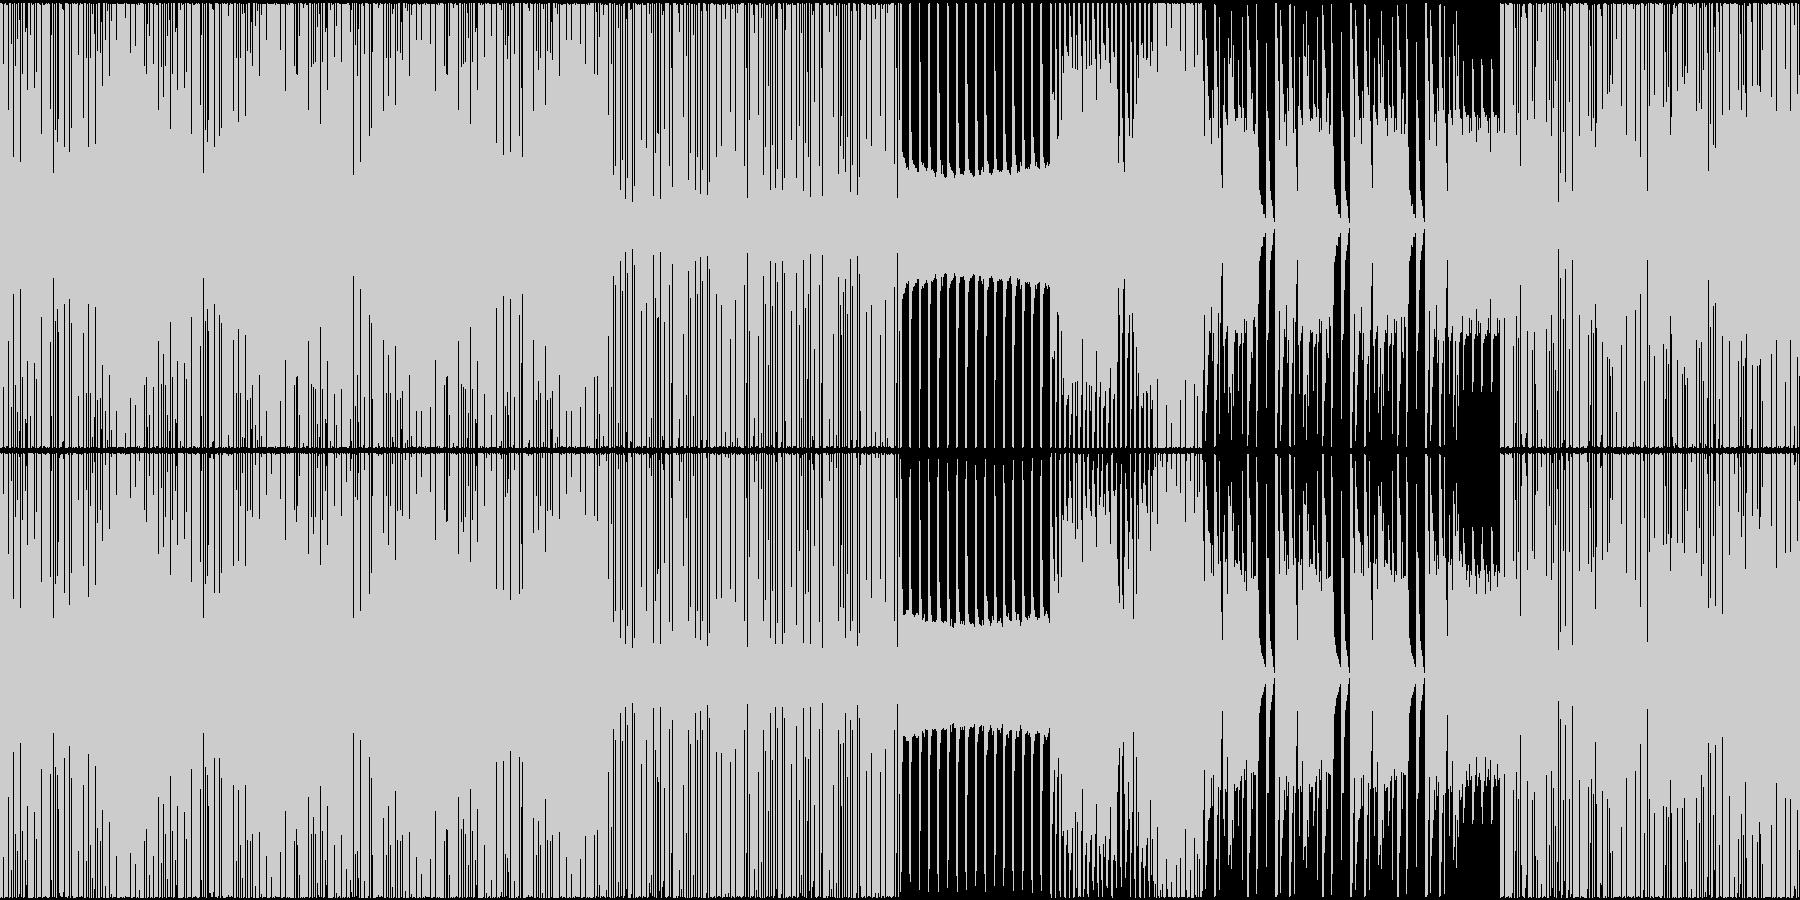 HIPHOP トロピカル EDM ループの未再生の波形